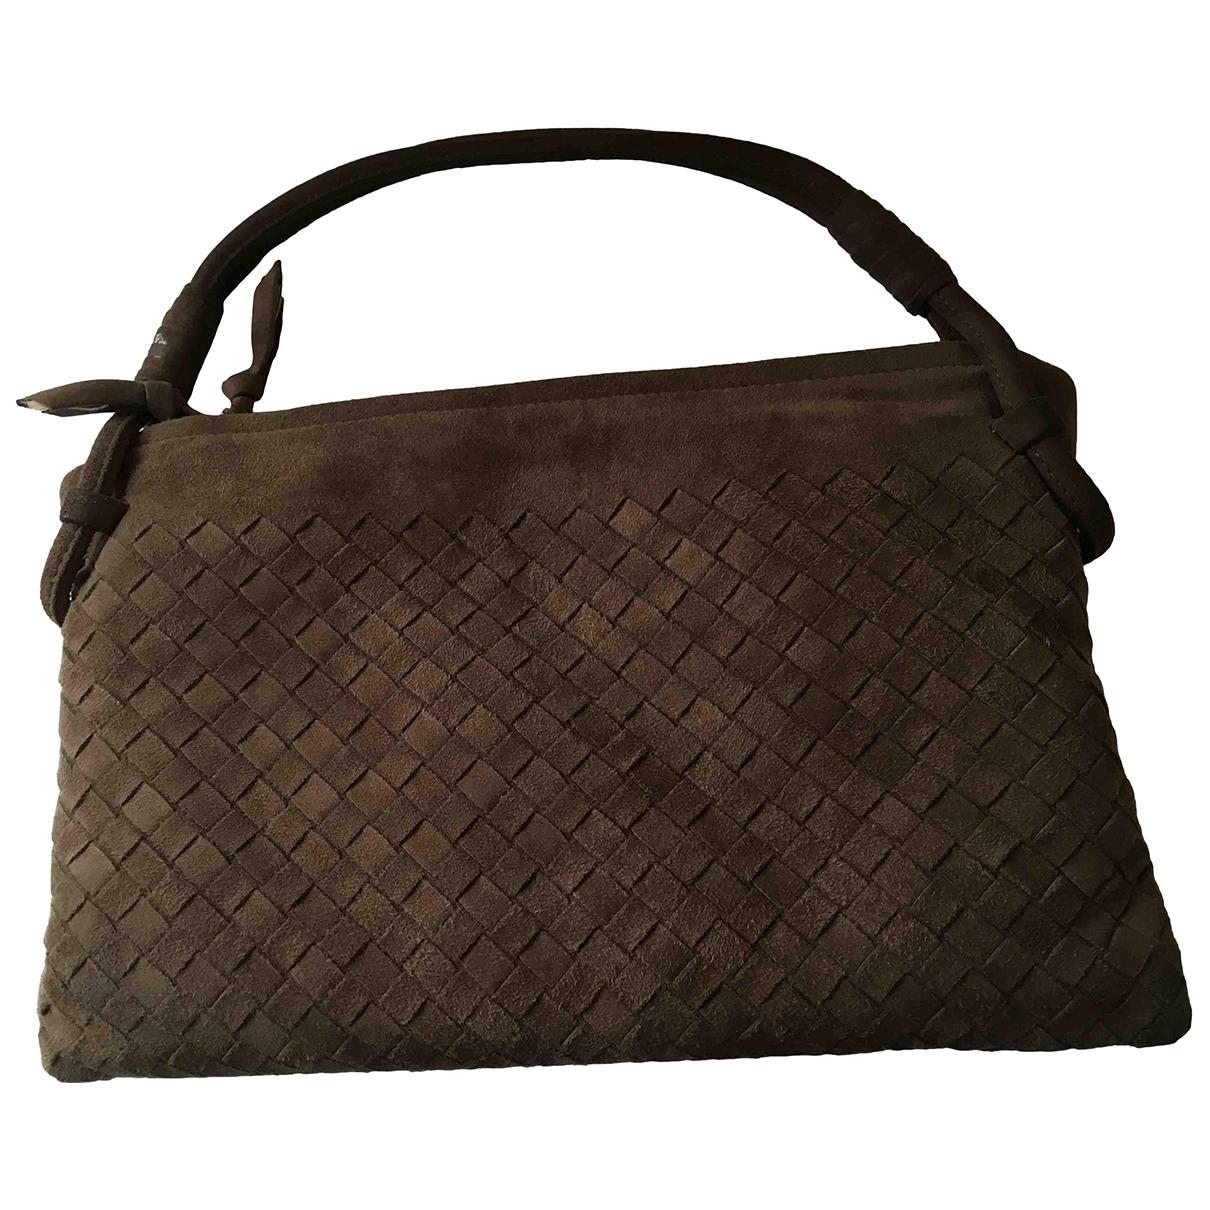 Bottega Veneta \N Handtasche in  Braun Veloursleder